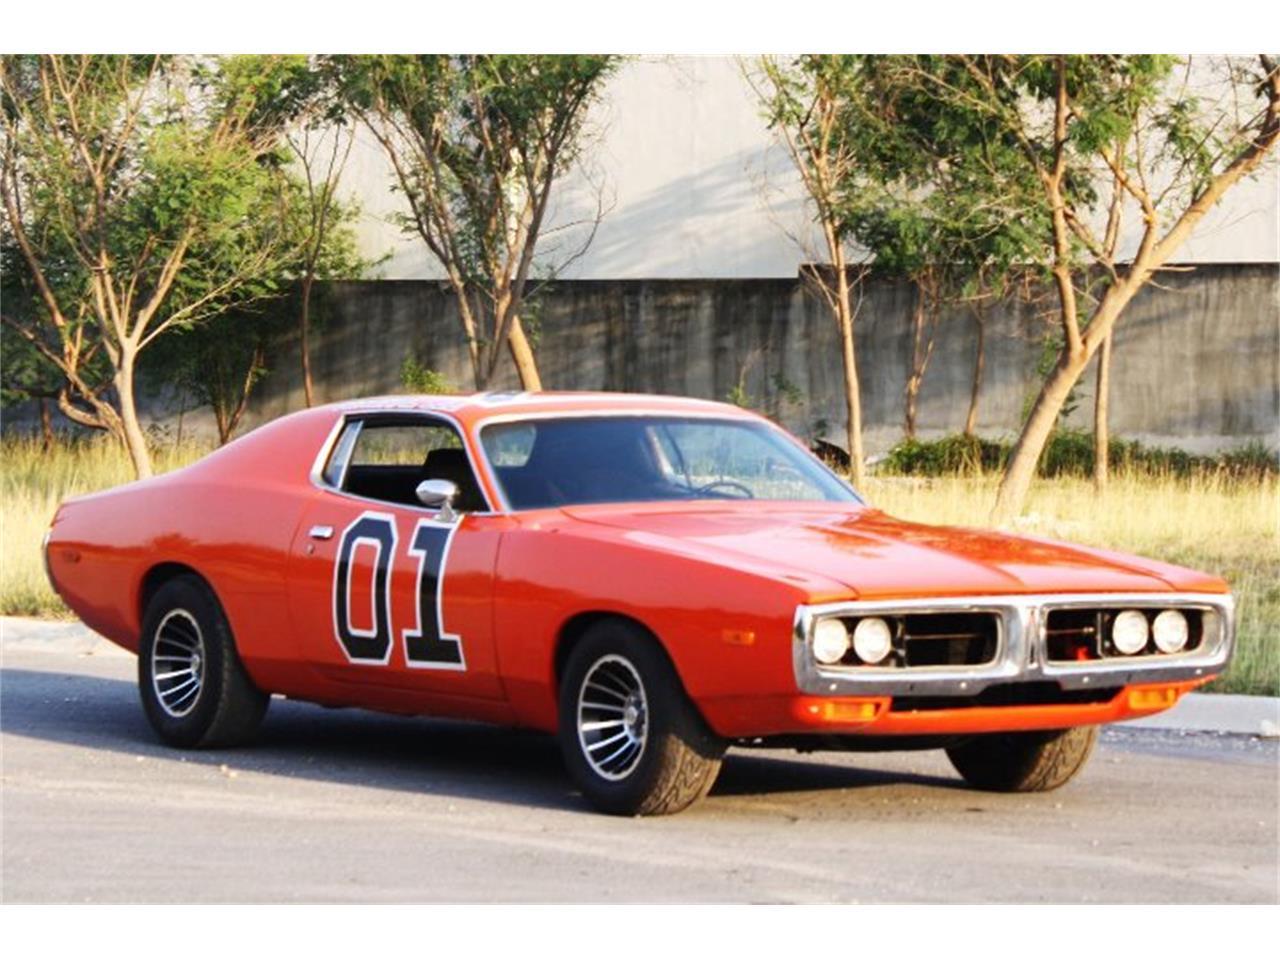 Houston Dodge Dealers >> 1972 Dodge Charger for Sale | ClassicCars.com | CC-768791